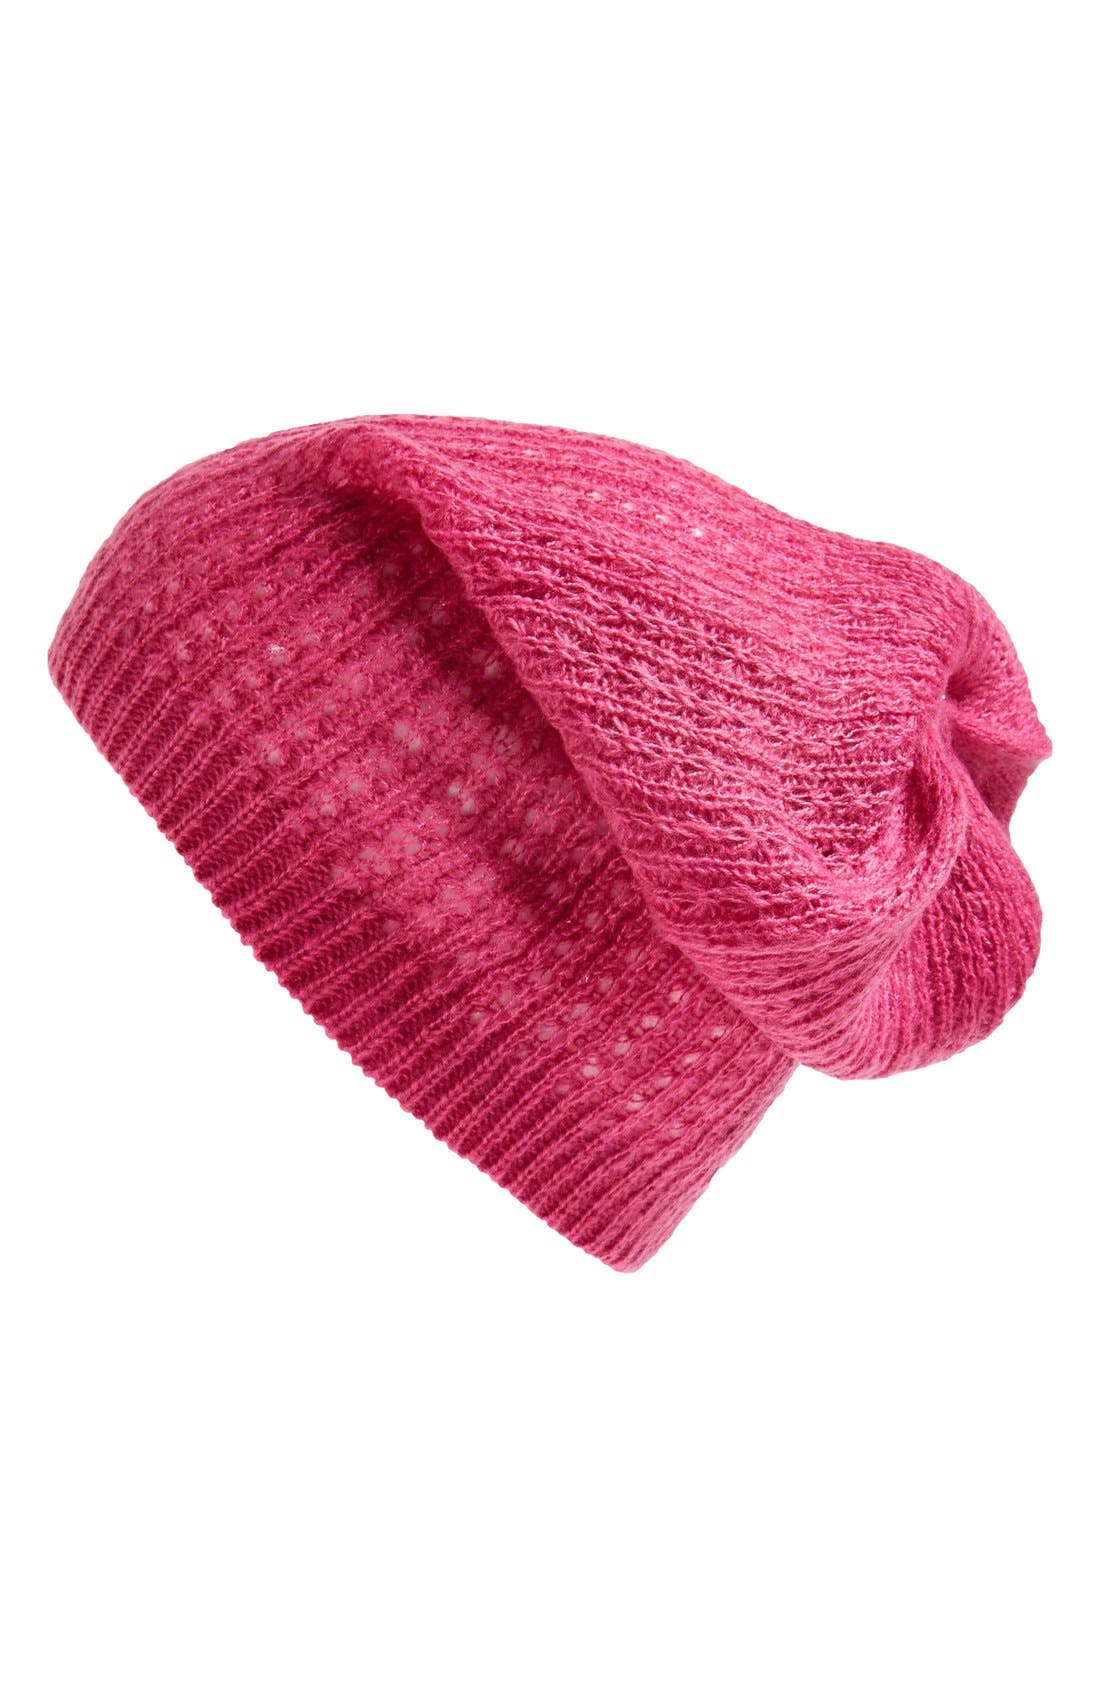 Alternate Image 1 Selected - Tildon Waffle Knit Slouch Hat